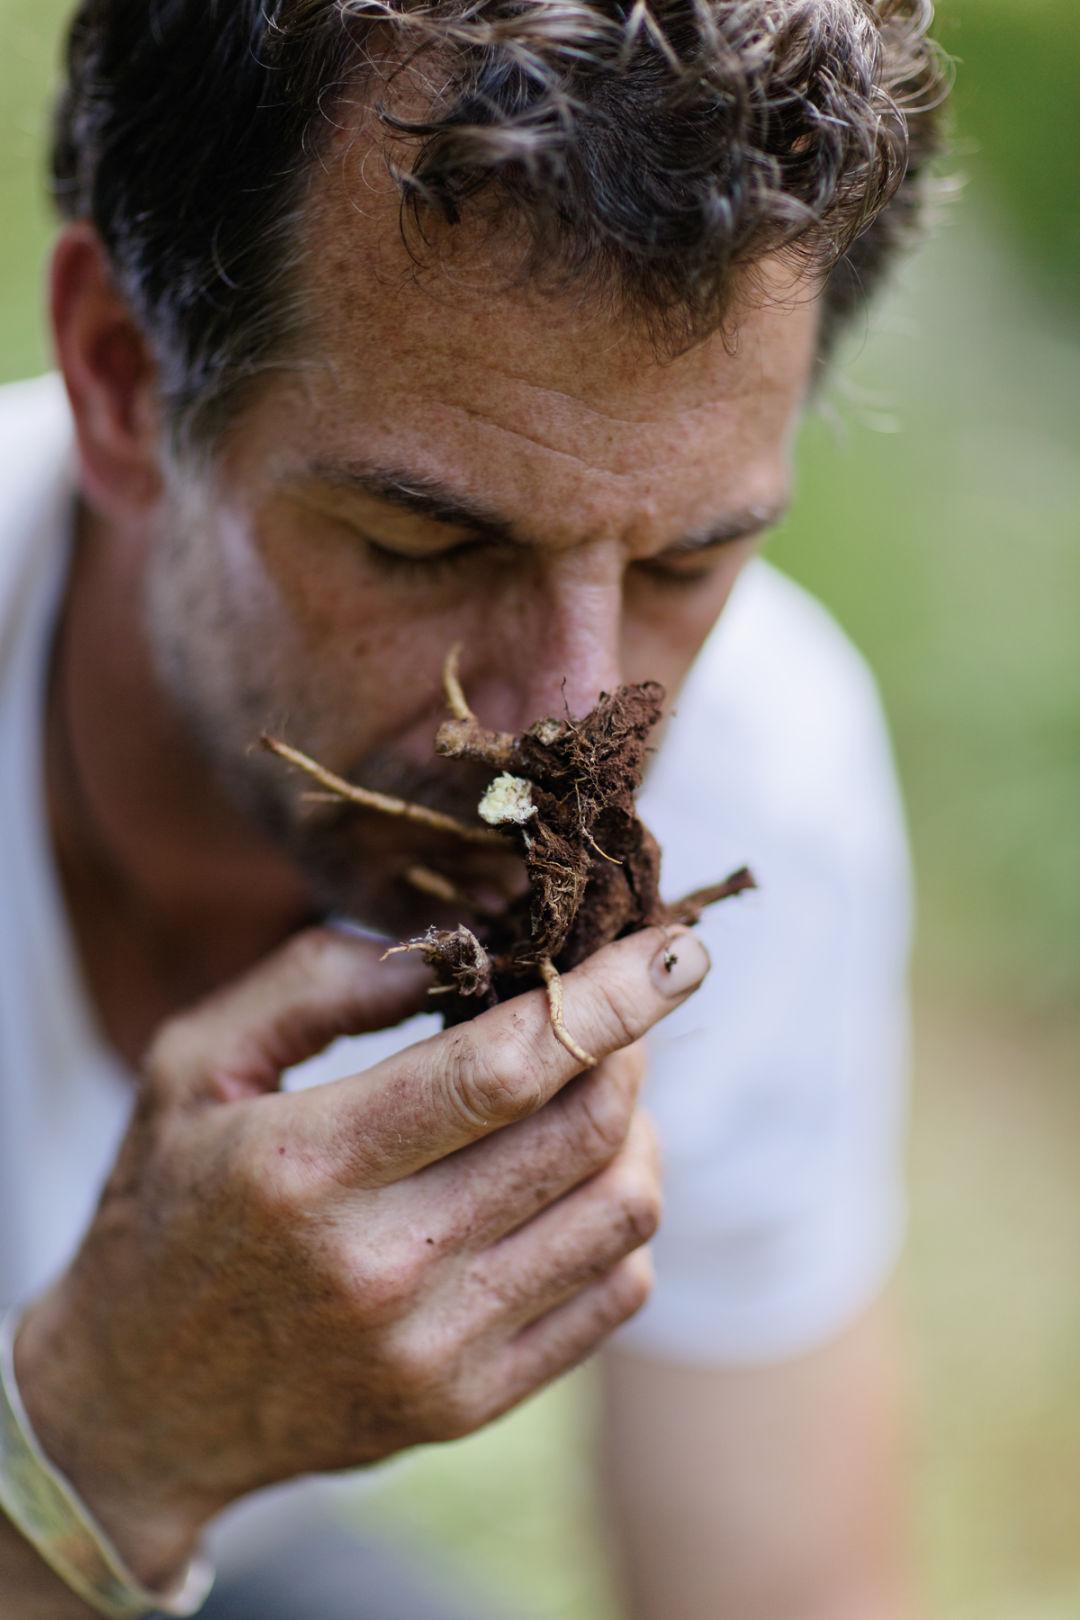 Angelica Bella Fotos foraging with aspen restaurateur c. barclay dodge | aspen